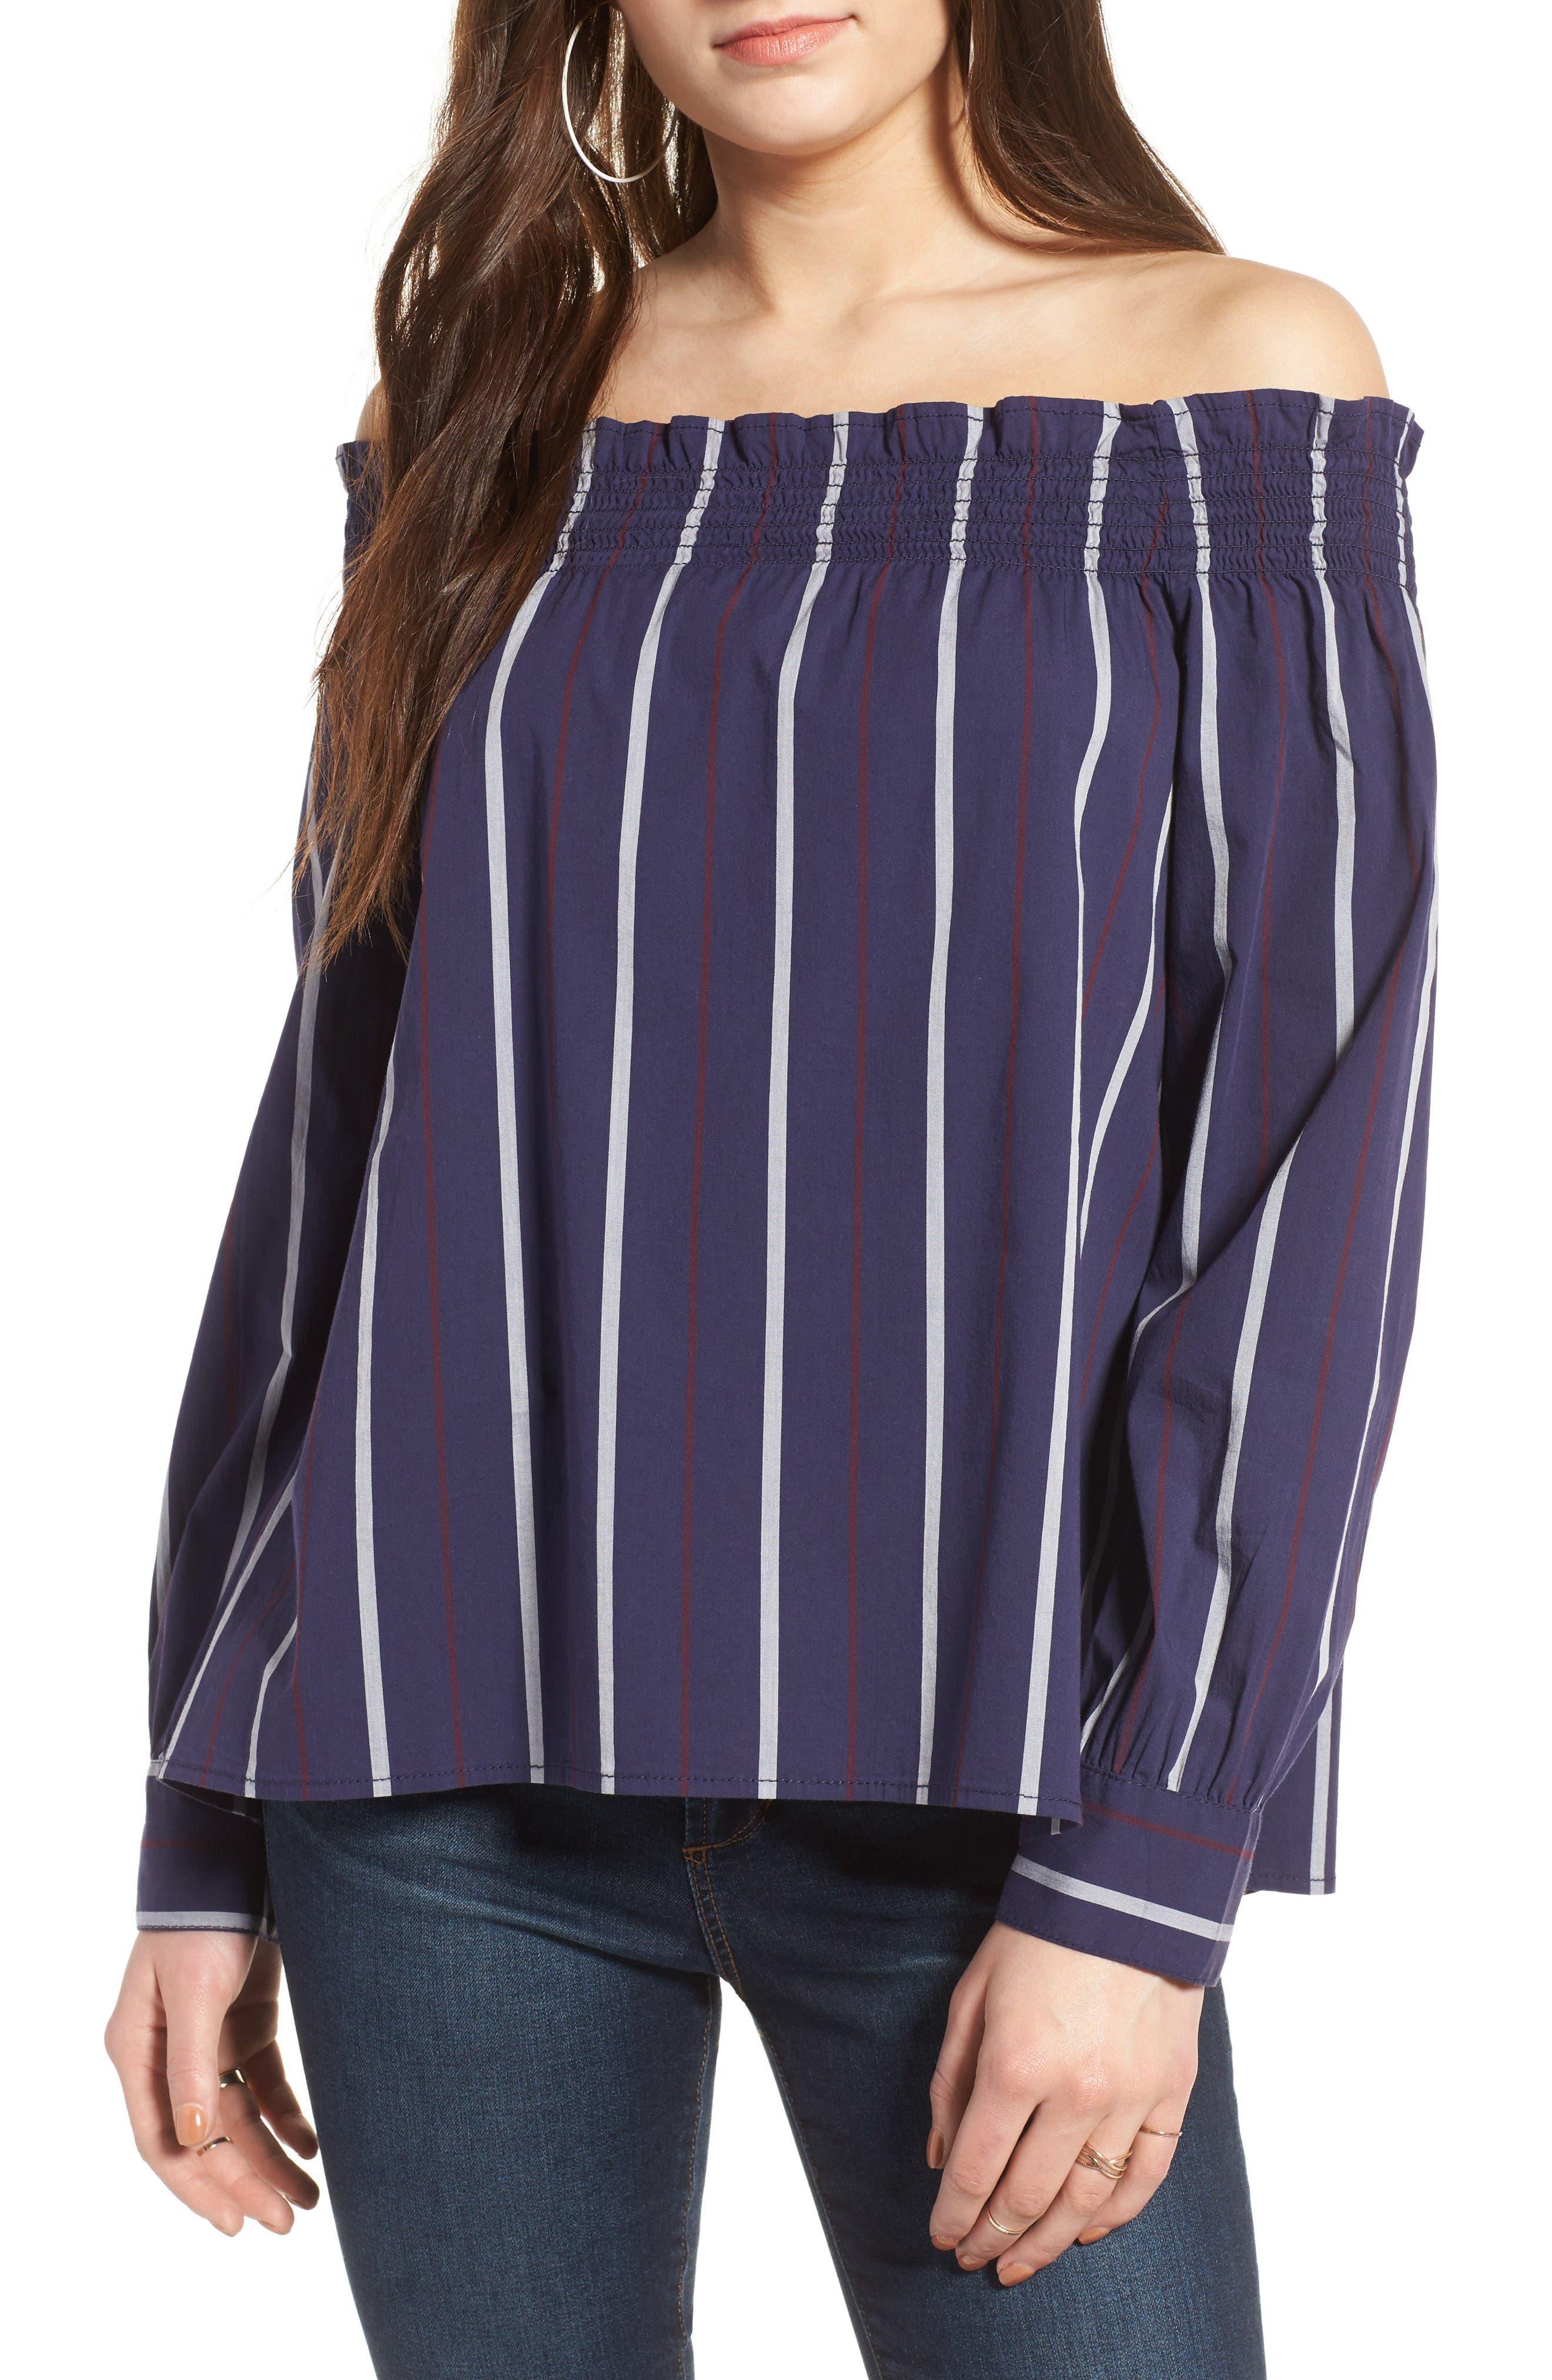 Alternate Image 1 Selected - BP. Stripe Off the Shoulder Top